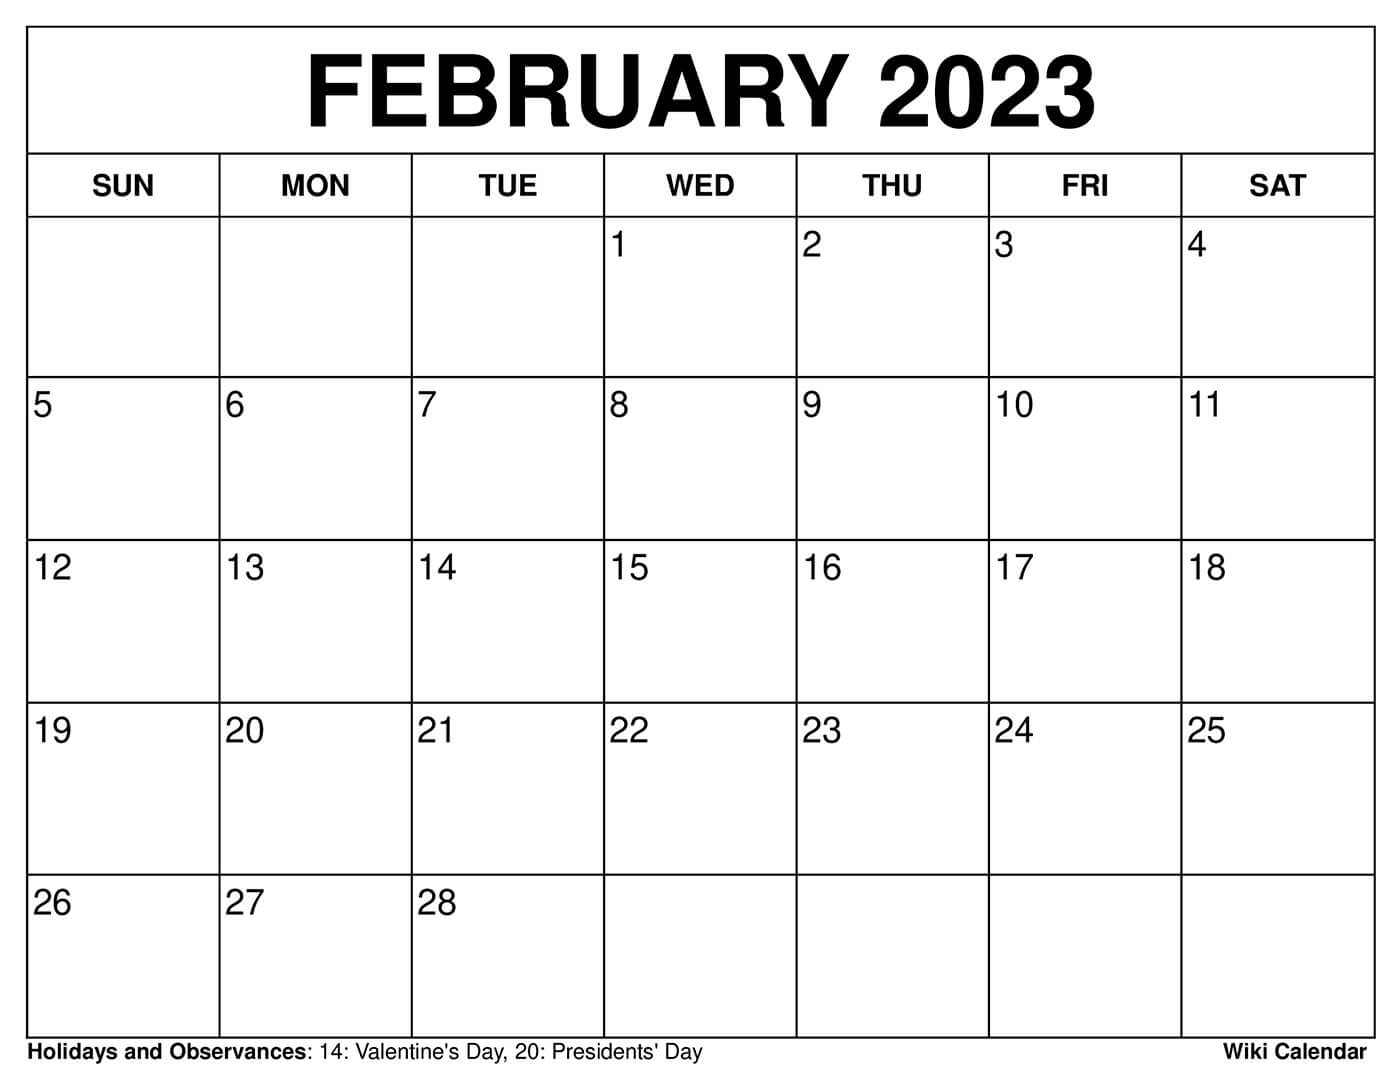 February 2023 Calendar